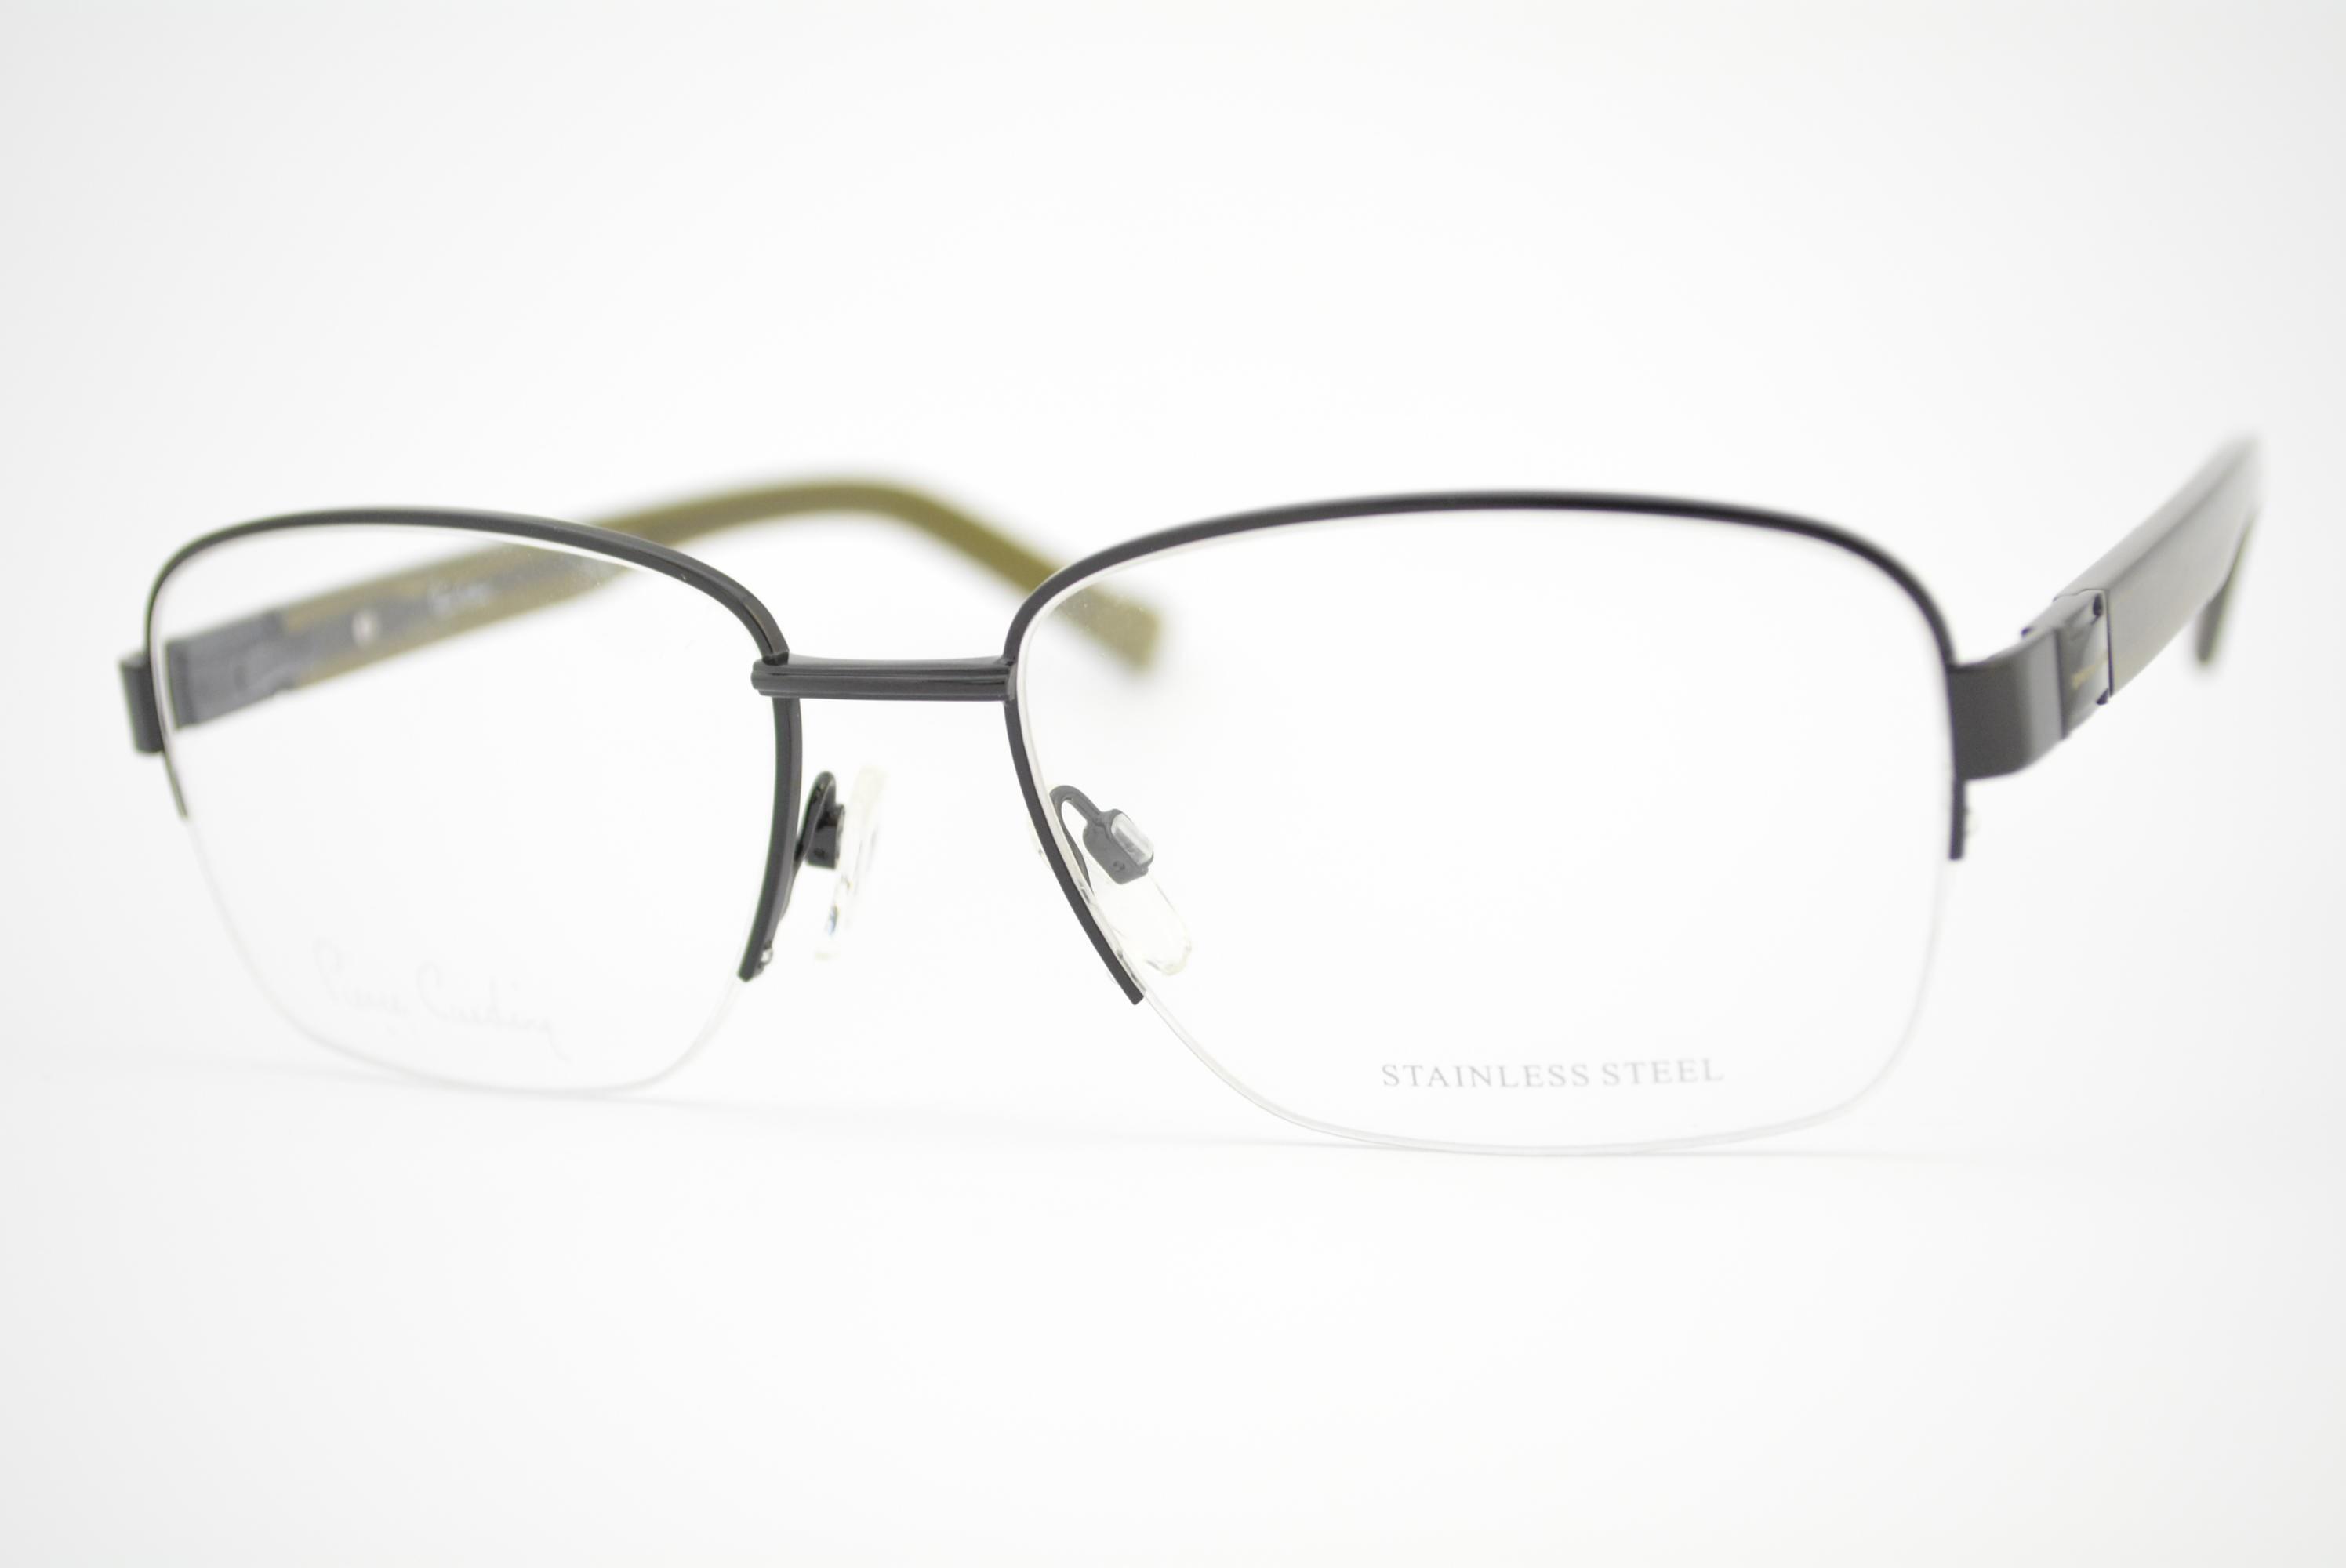 armação de óculos Pierre Cardin mod pc6836 807